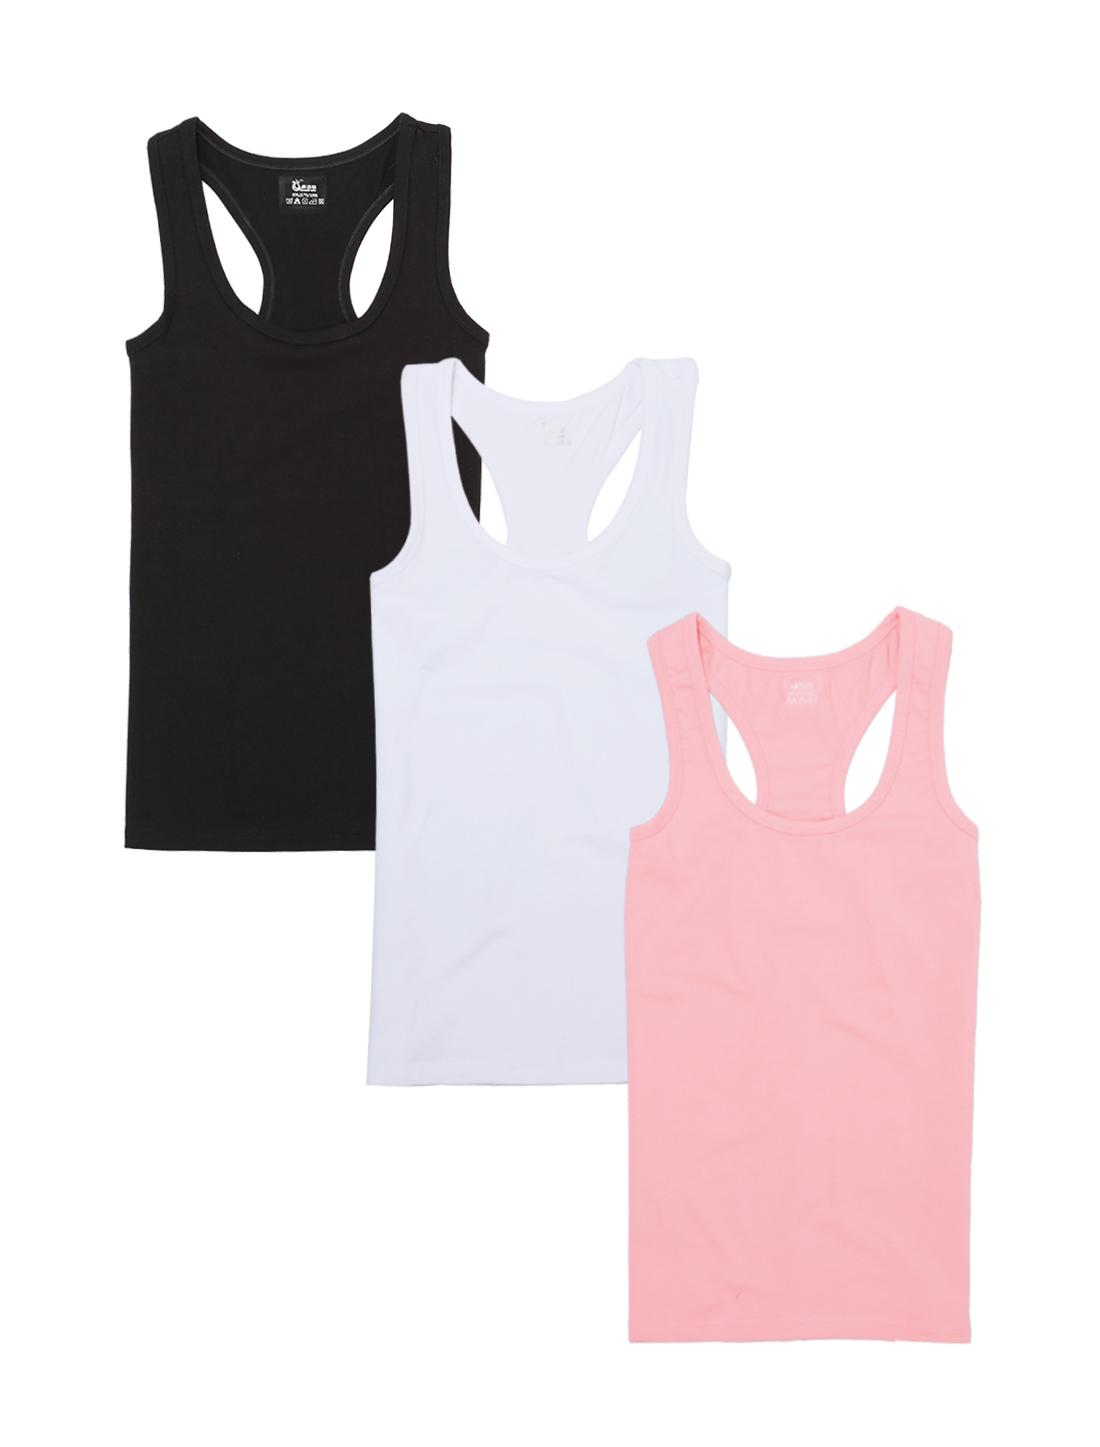 Black Vest Top Women/'s Ladies Stretchy Scoop Neck Basic Top